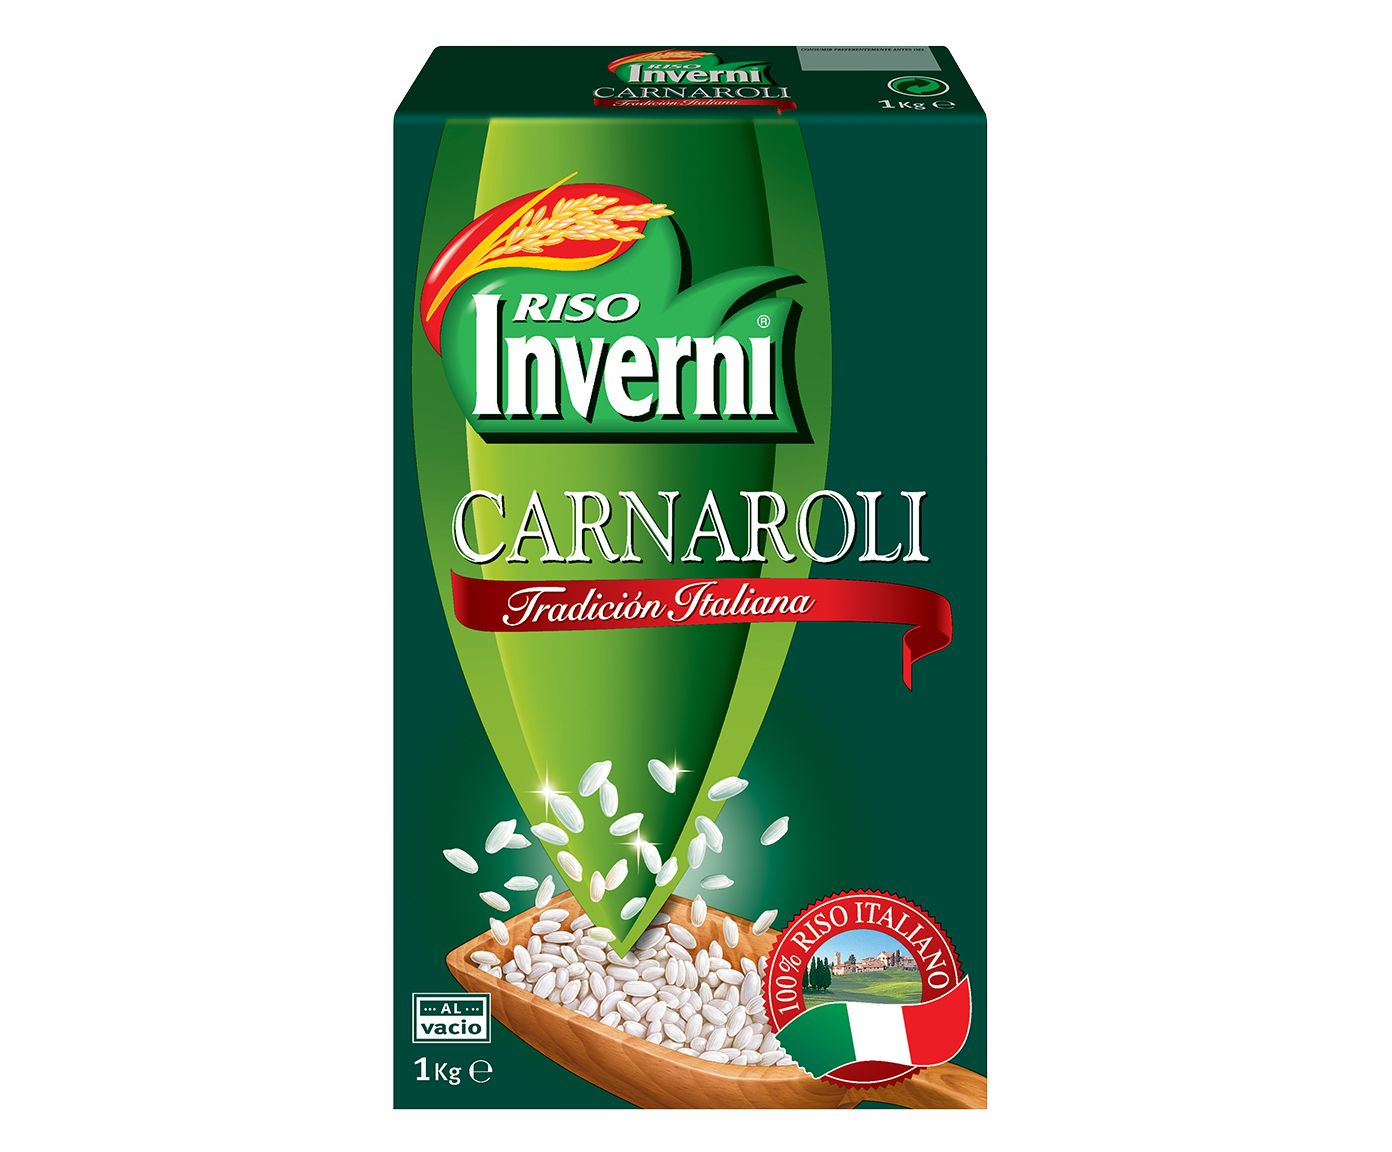 Arroz Italiano Inverni Carnaroli - 1Kg   Westwing.com.br